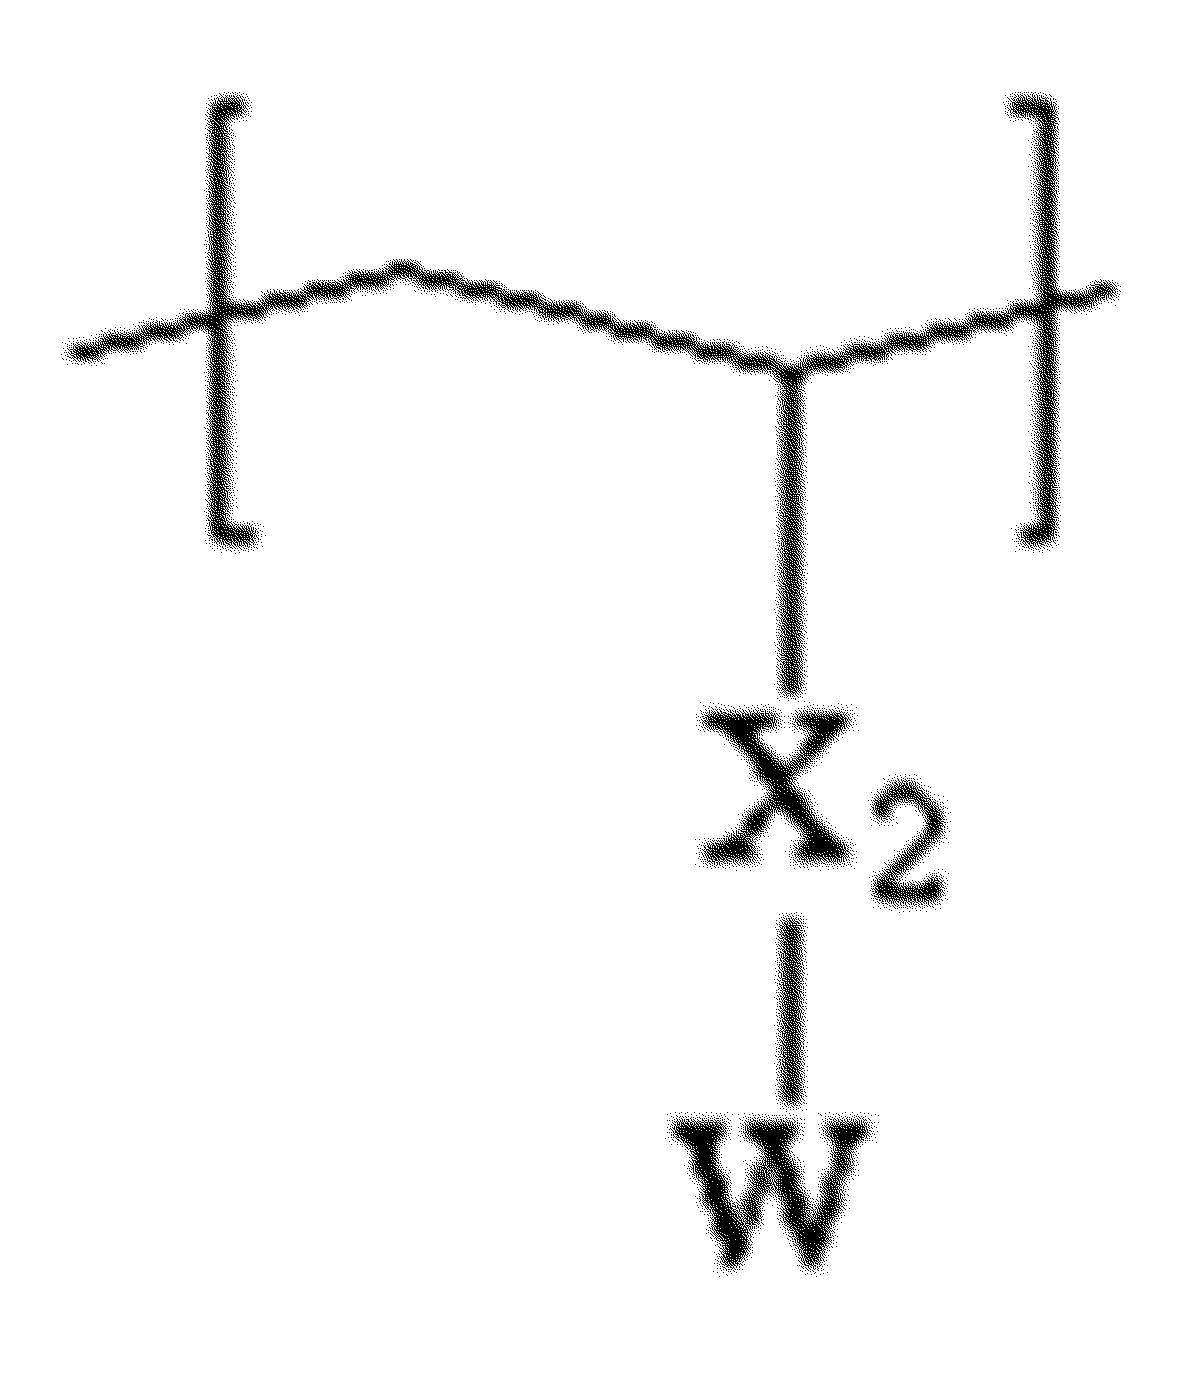 Figure PCTKR2015010327-appb-I000003